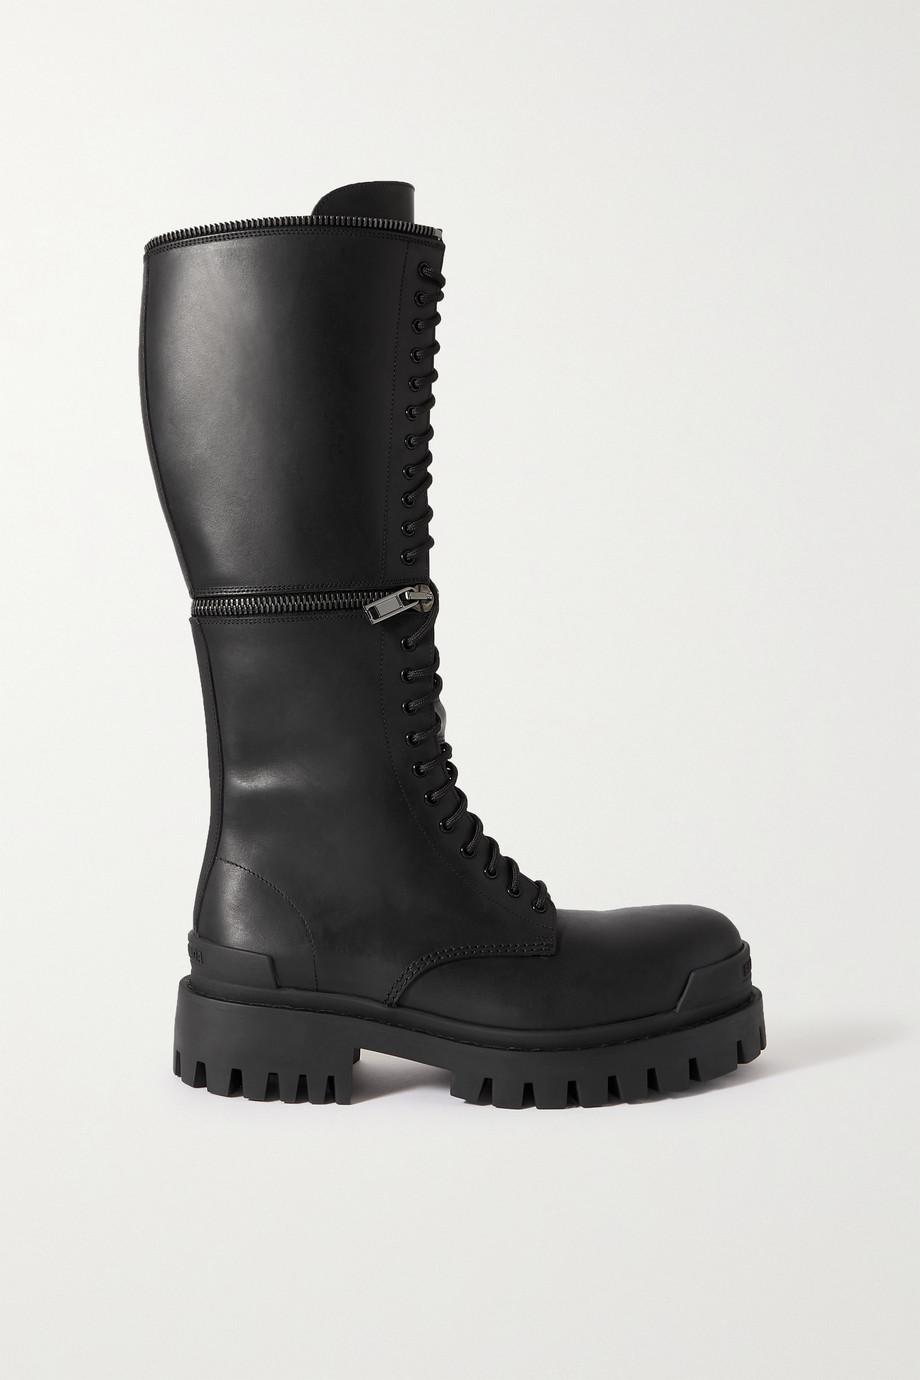 Balenciaga Convertible leather platform boots